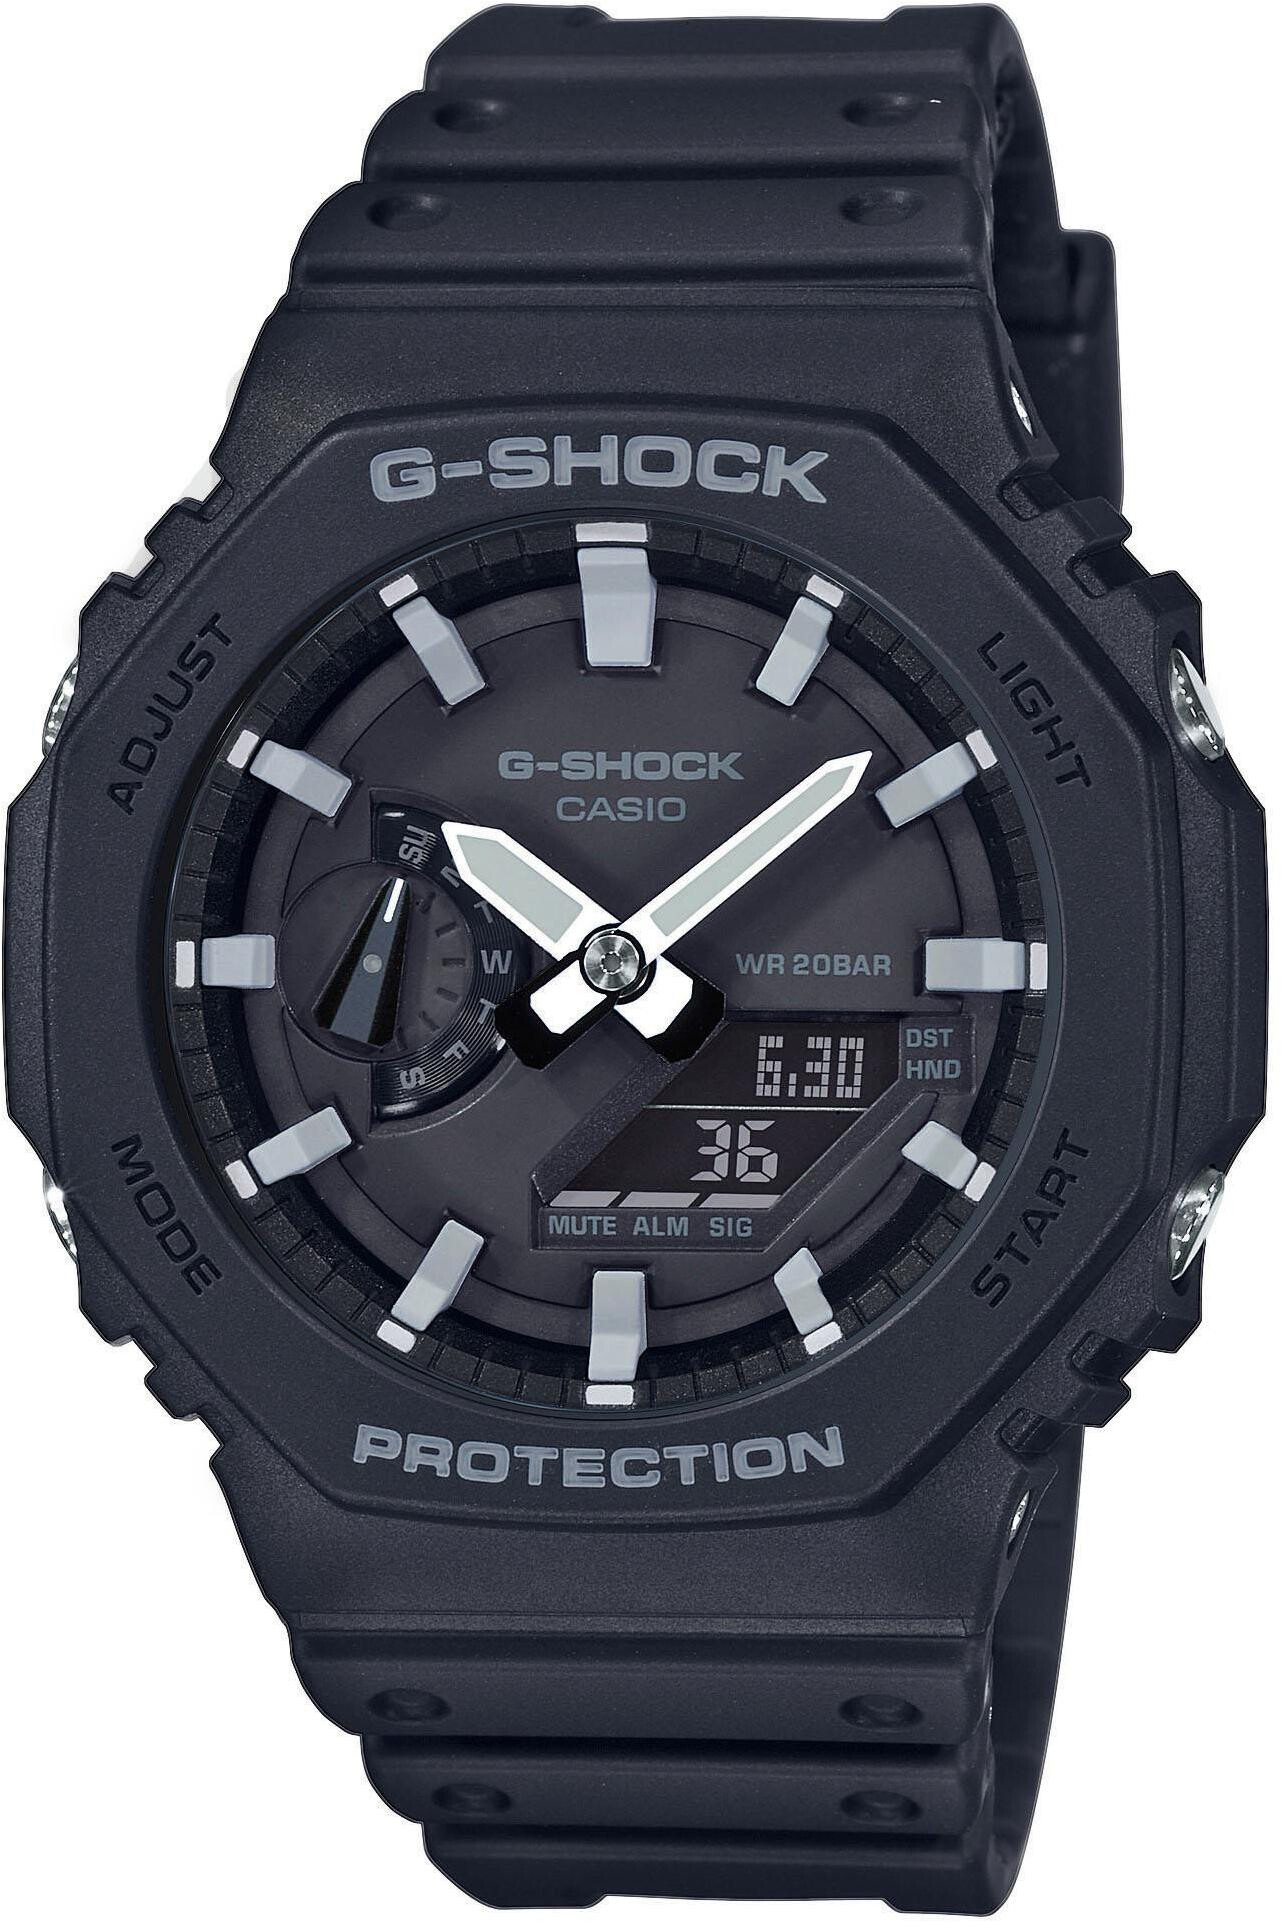 CASIO G-SHOCK Classic GA-2100-1AER Watch Men, black   Sports watches